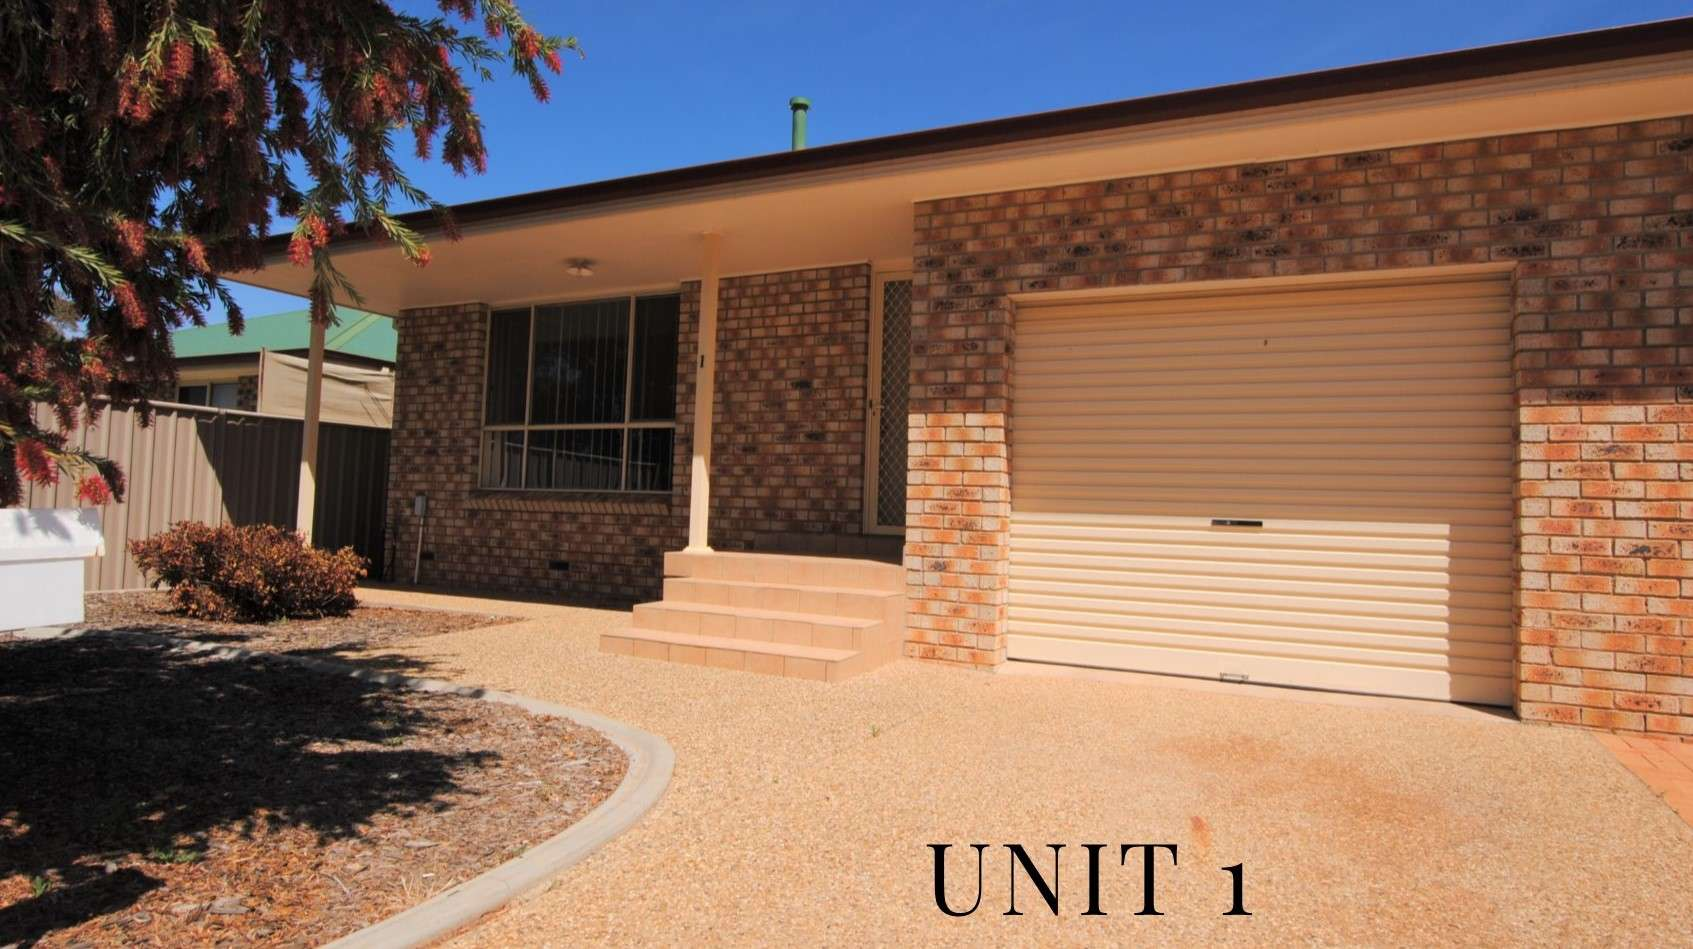 Unit 1/5A Andreatta Road, Hanwood, NSW 2680